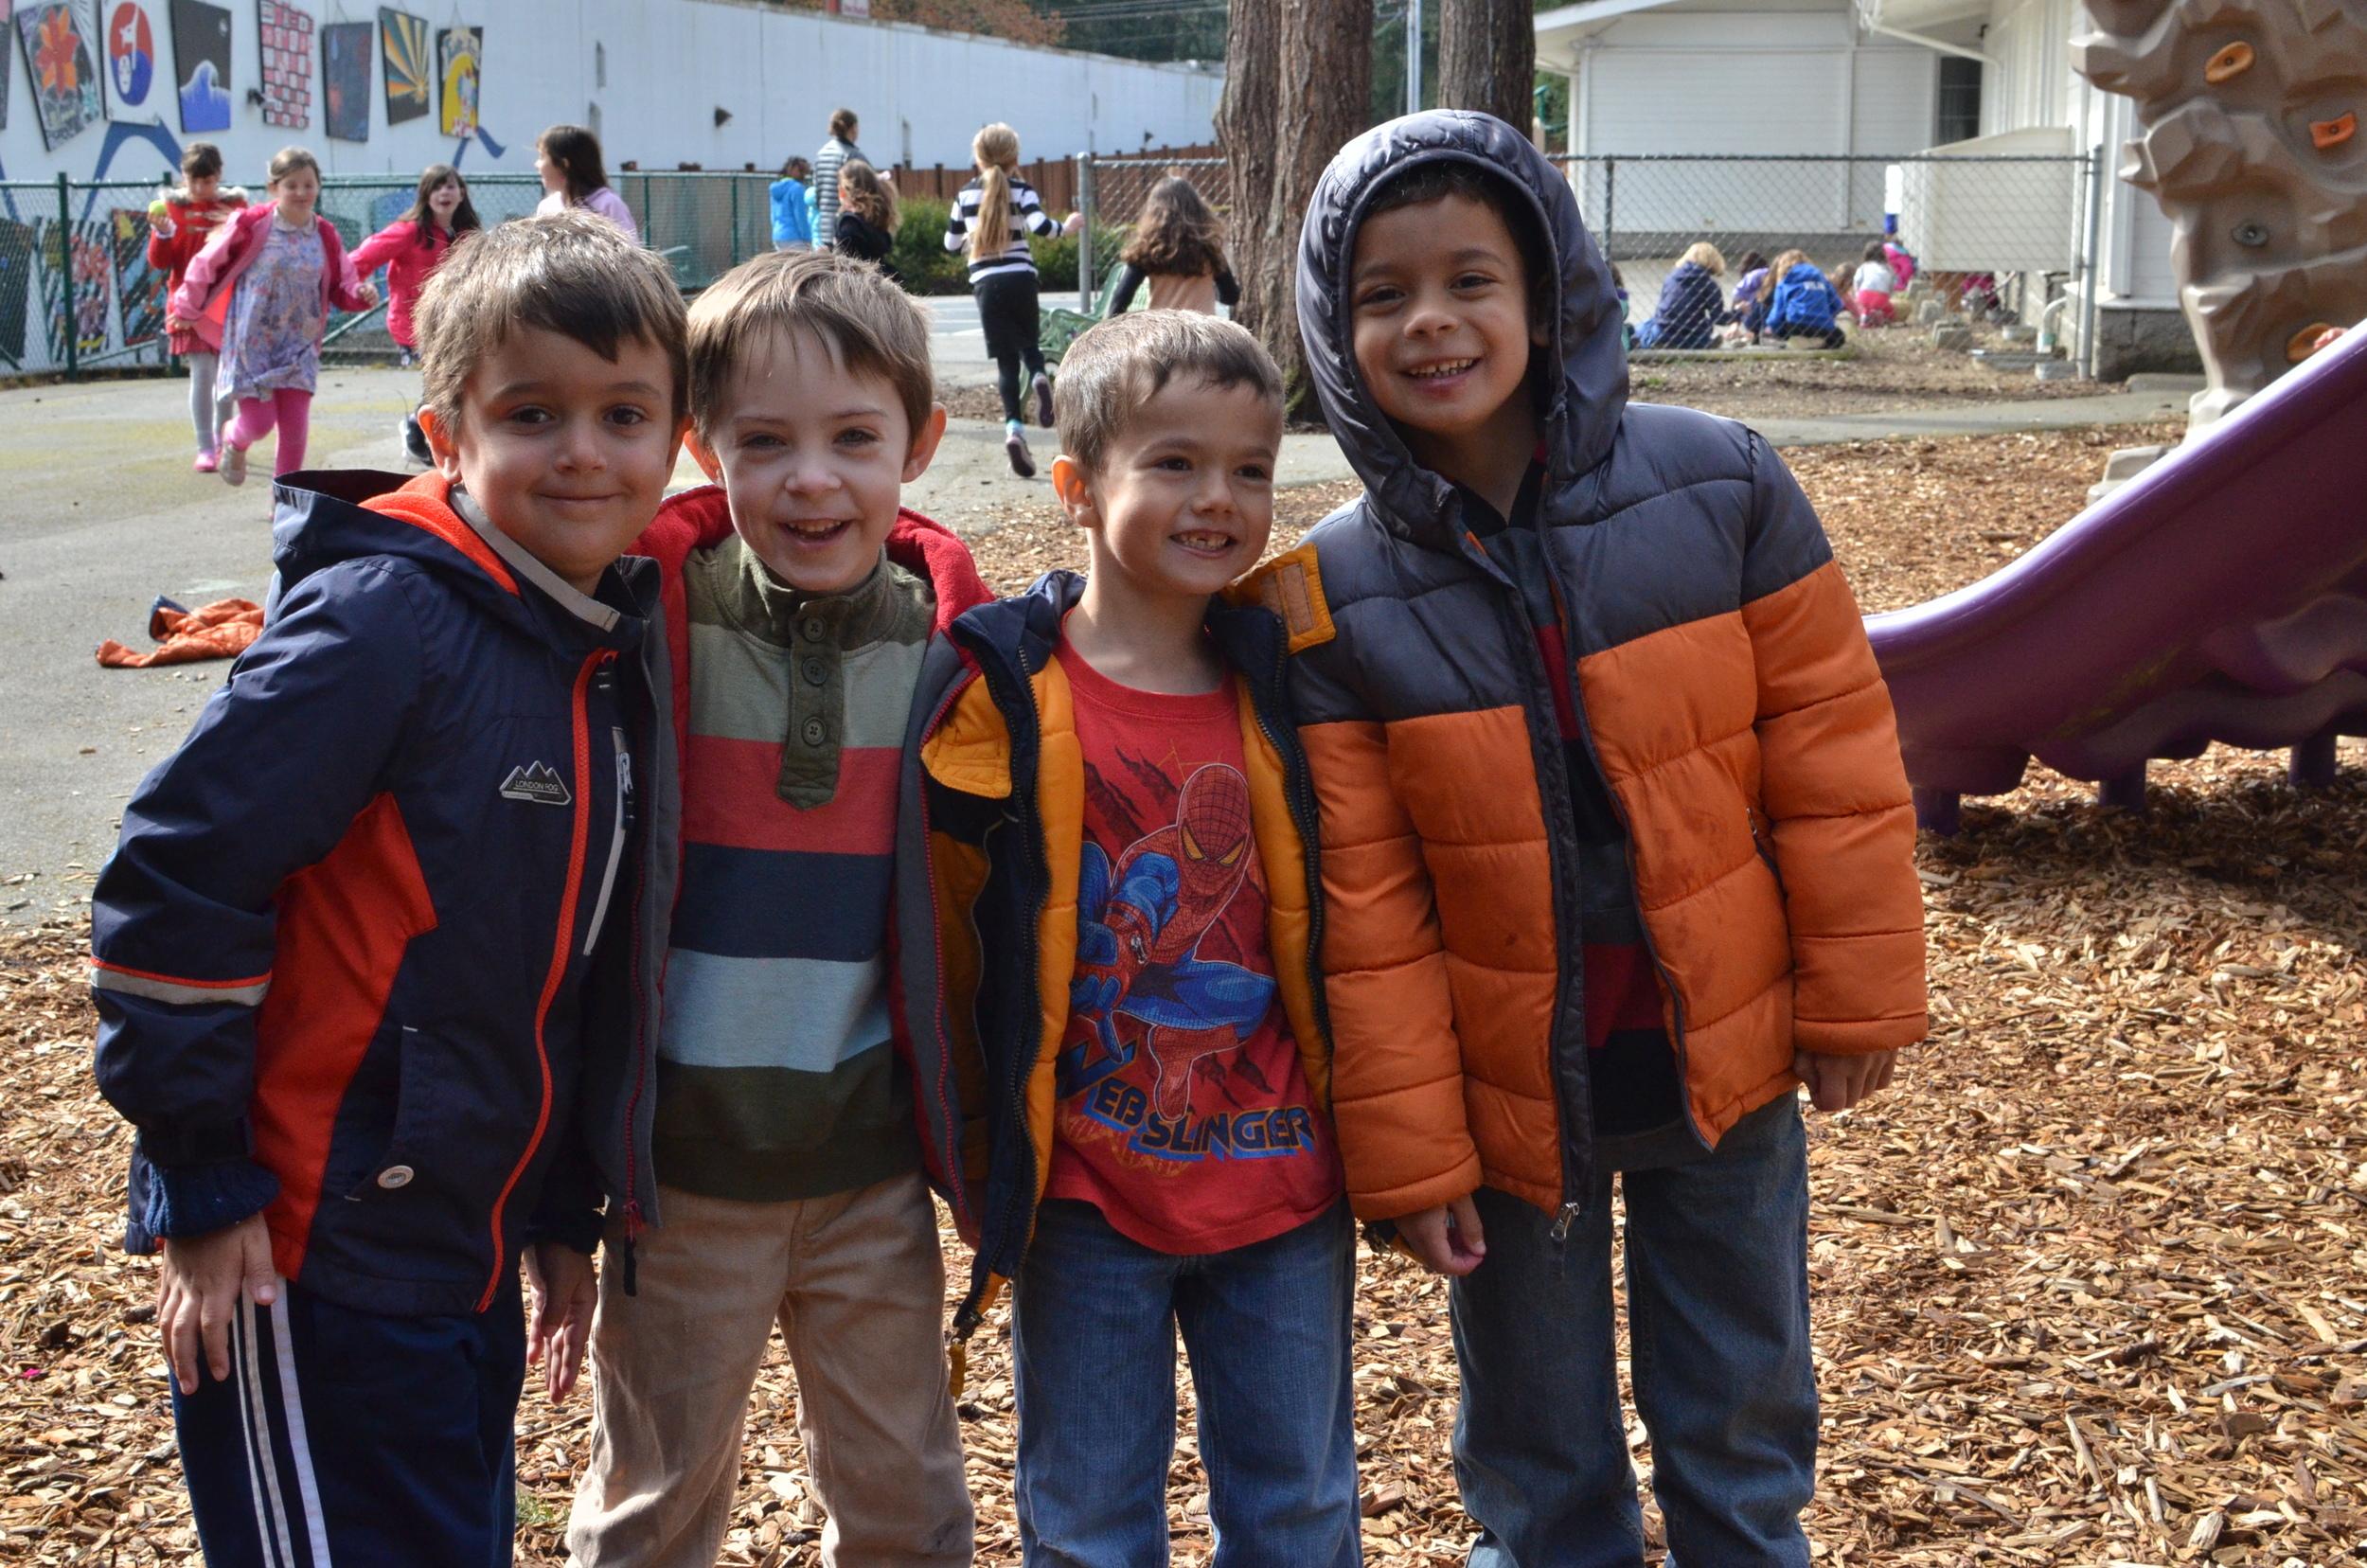 Strong school communities are built on belonging.